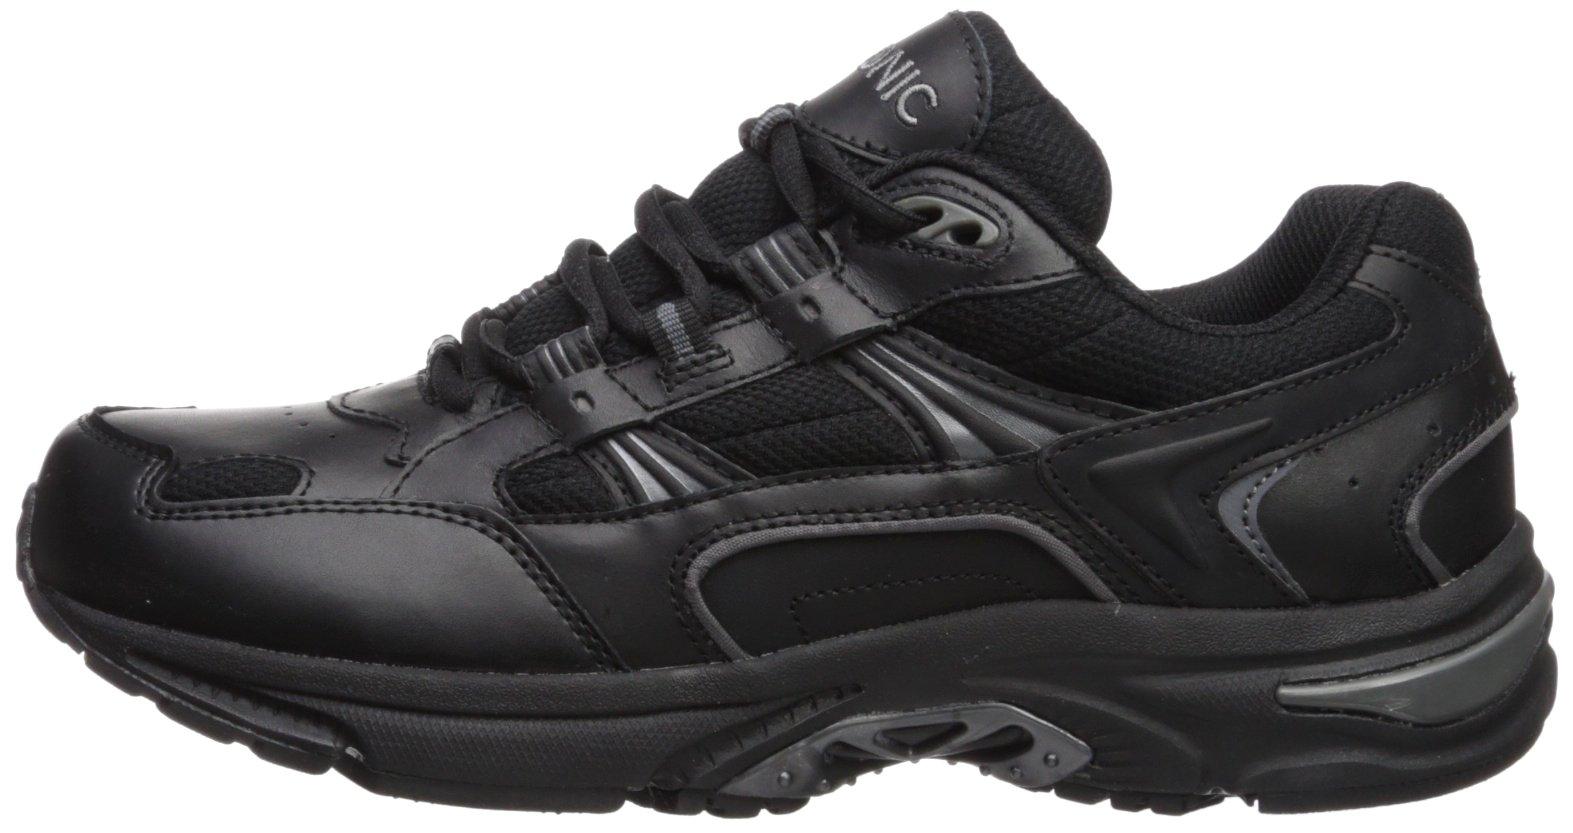 Vionic Women's Walker Classic Shoes, 8 B(M) US, Black by Vionic (Image #5)